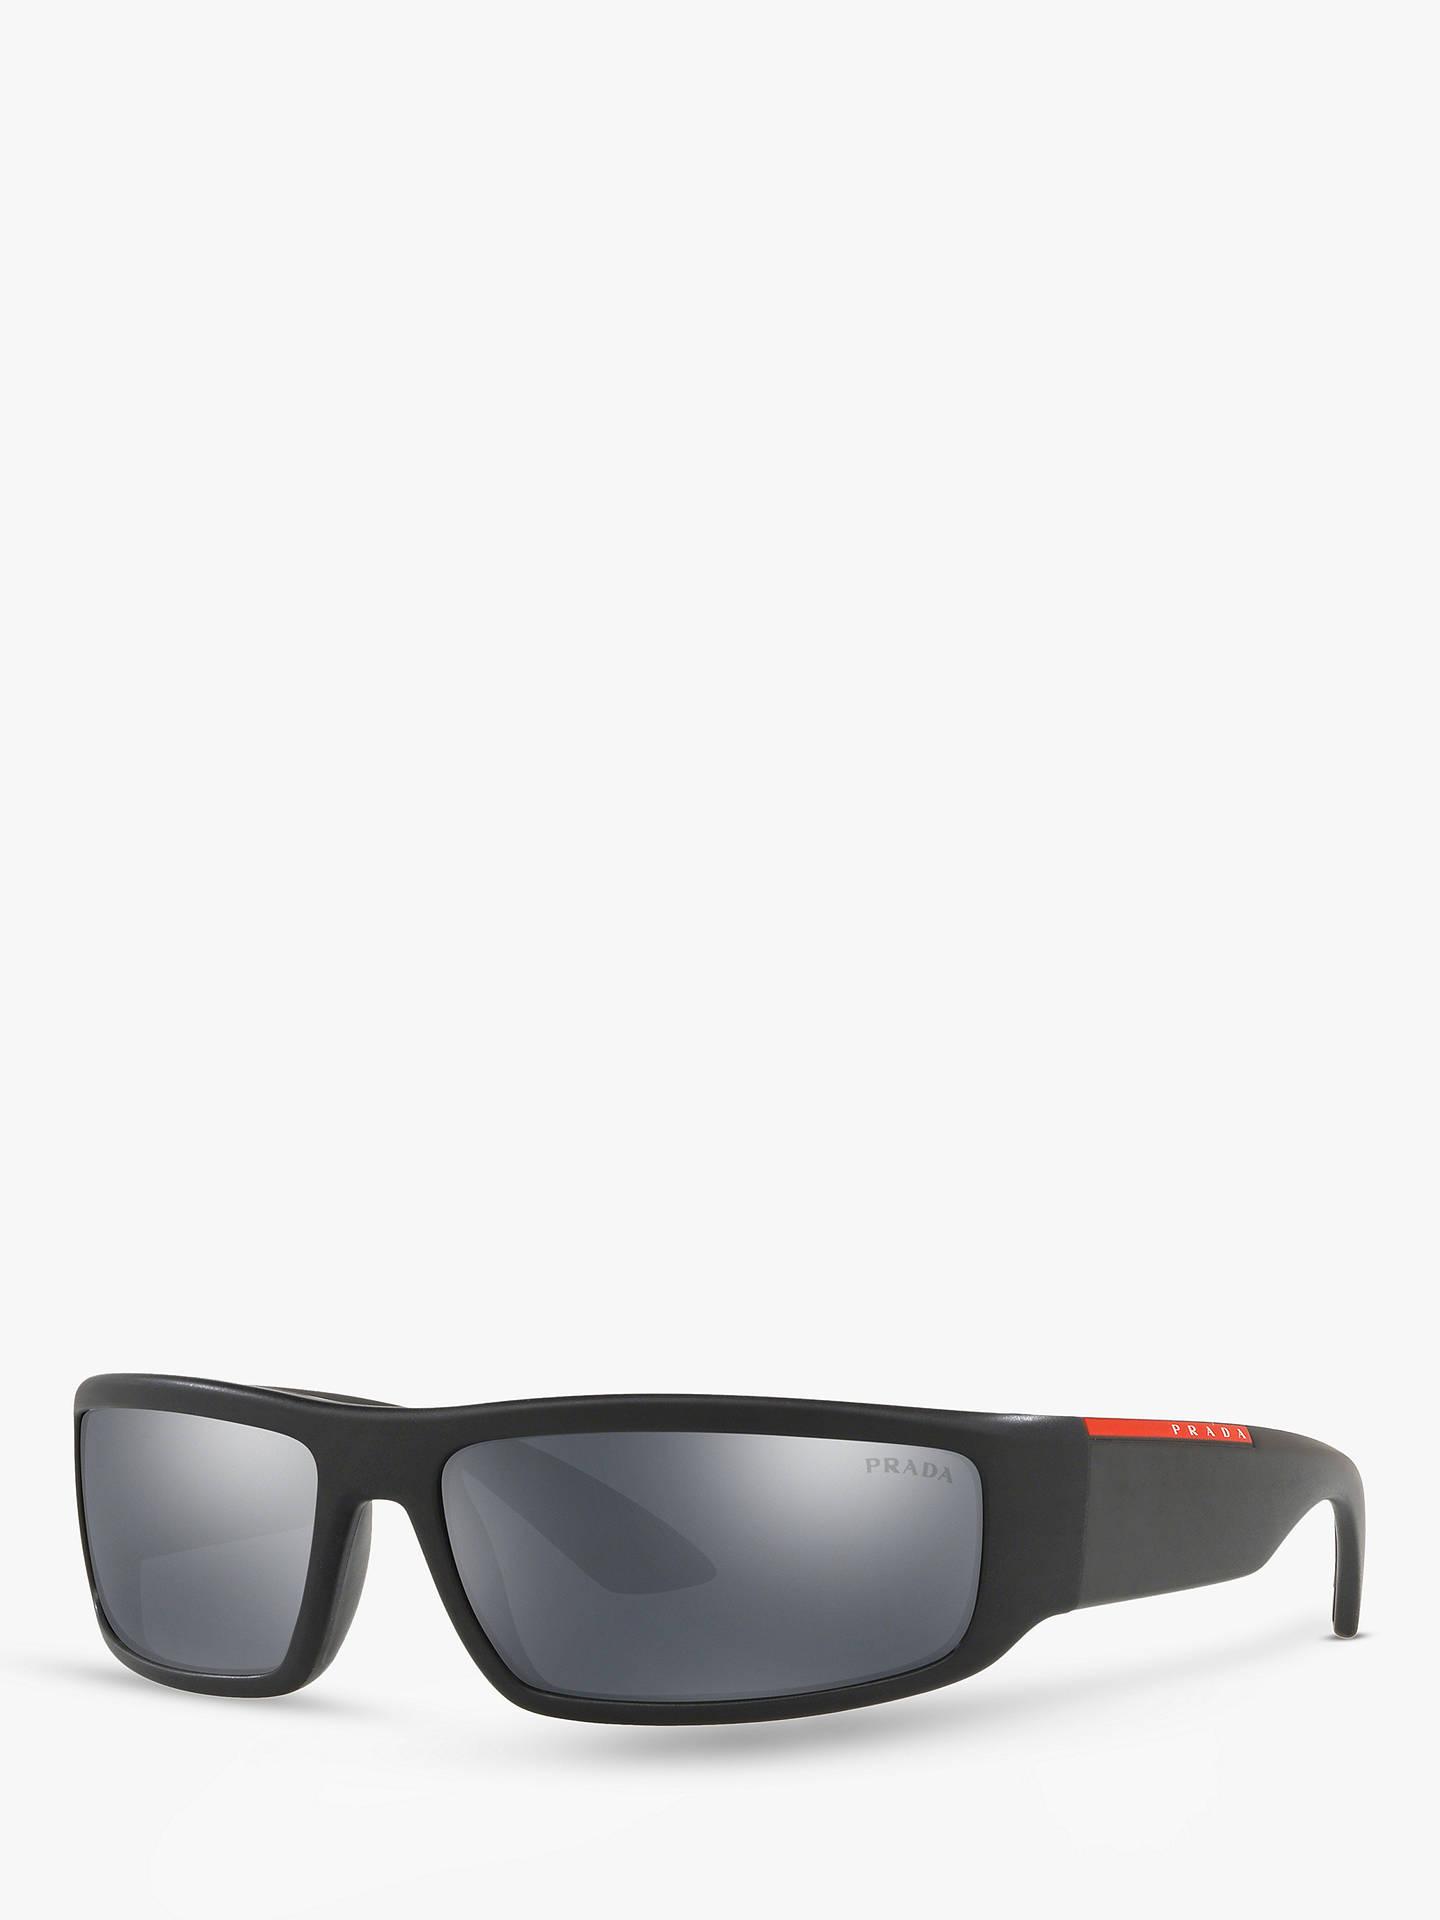 ebf9ad38dc0 Prada PS 02US Men s Rectangular Sunglasses at John Lewis   Partners